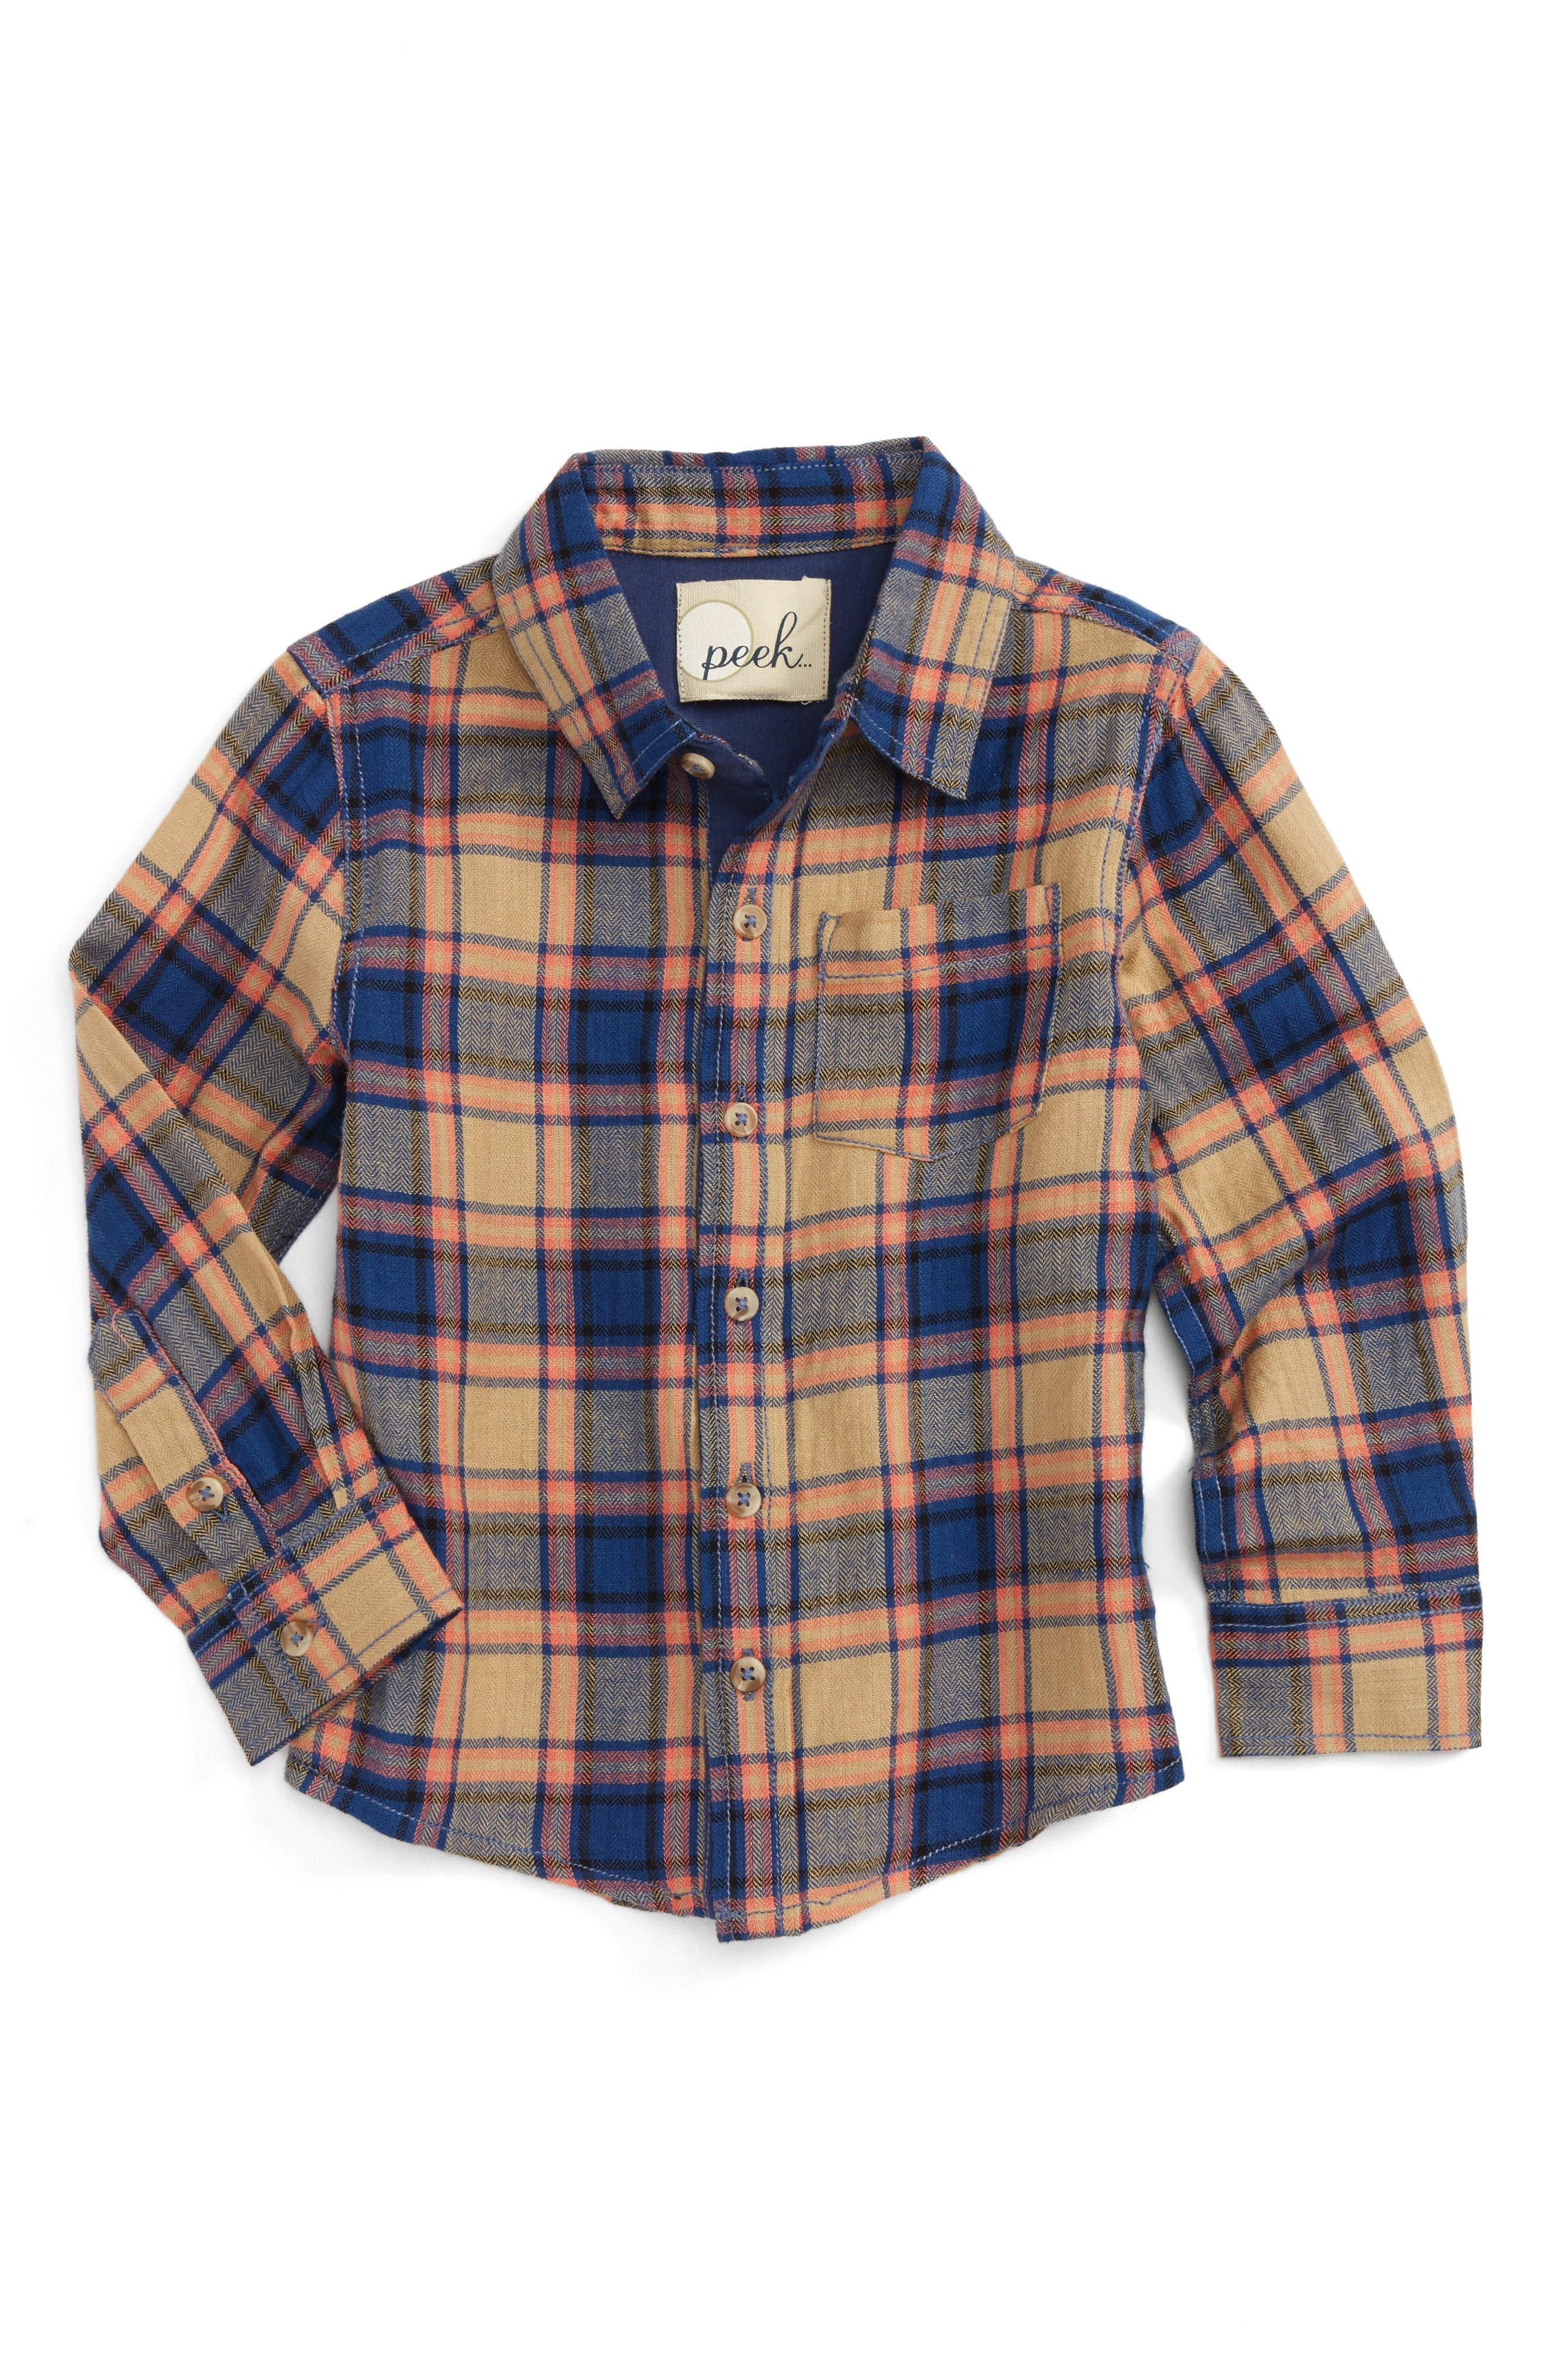 Alternate Image 1 Selected - Peek Henry Plaid Woven Shirt (Toddler Boys, Little Boys & Big Boys)